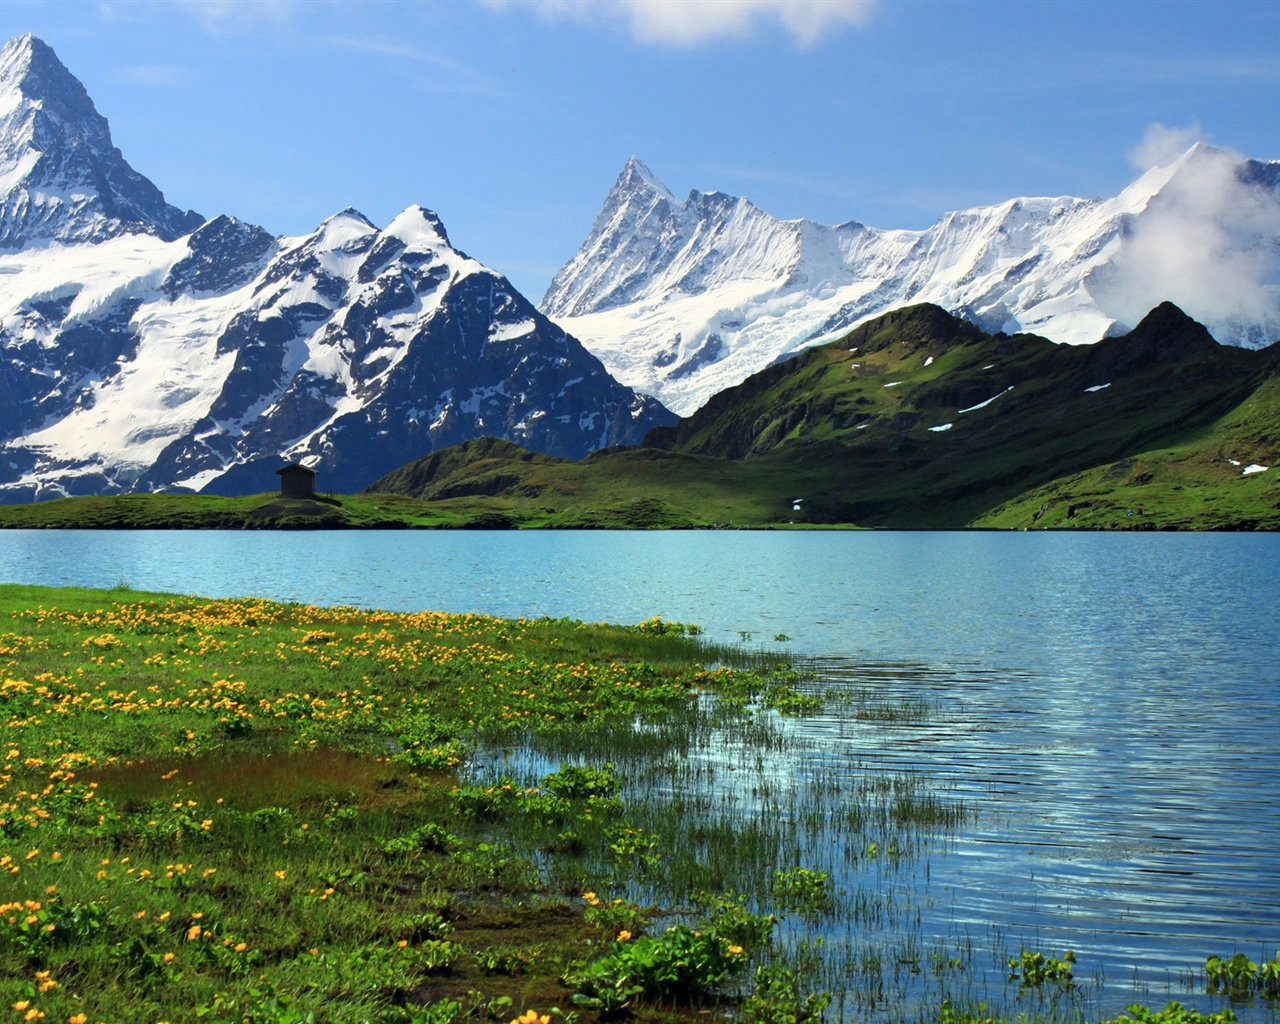 fonds d 39 cran suisse berne nature paysage montagnes enneig es rivi re de l 39 herbe des. Black Bedroom Furniture Sets. Home Design Ideas